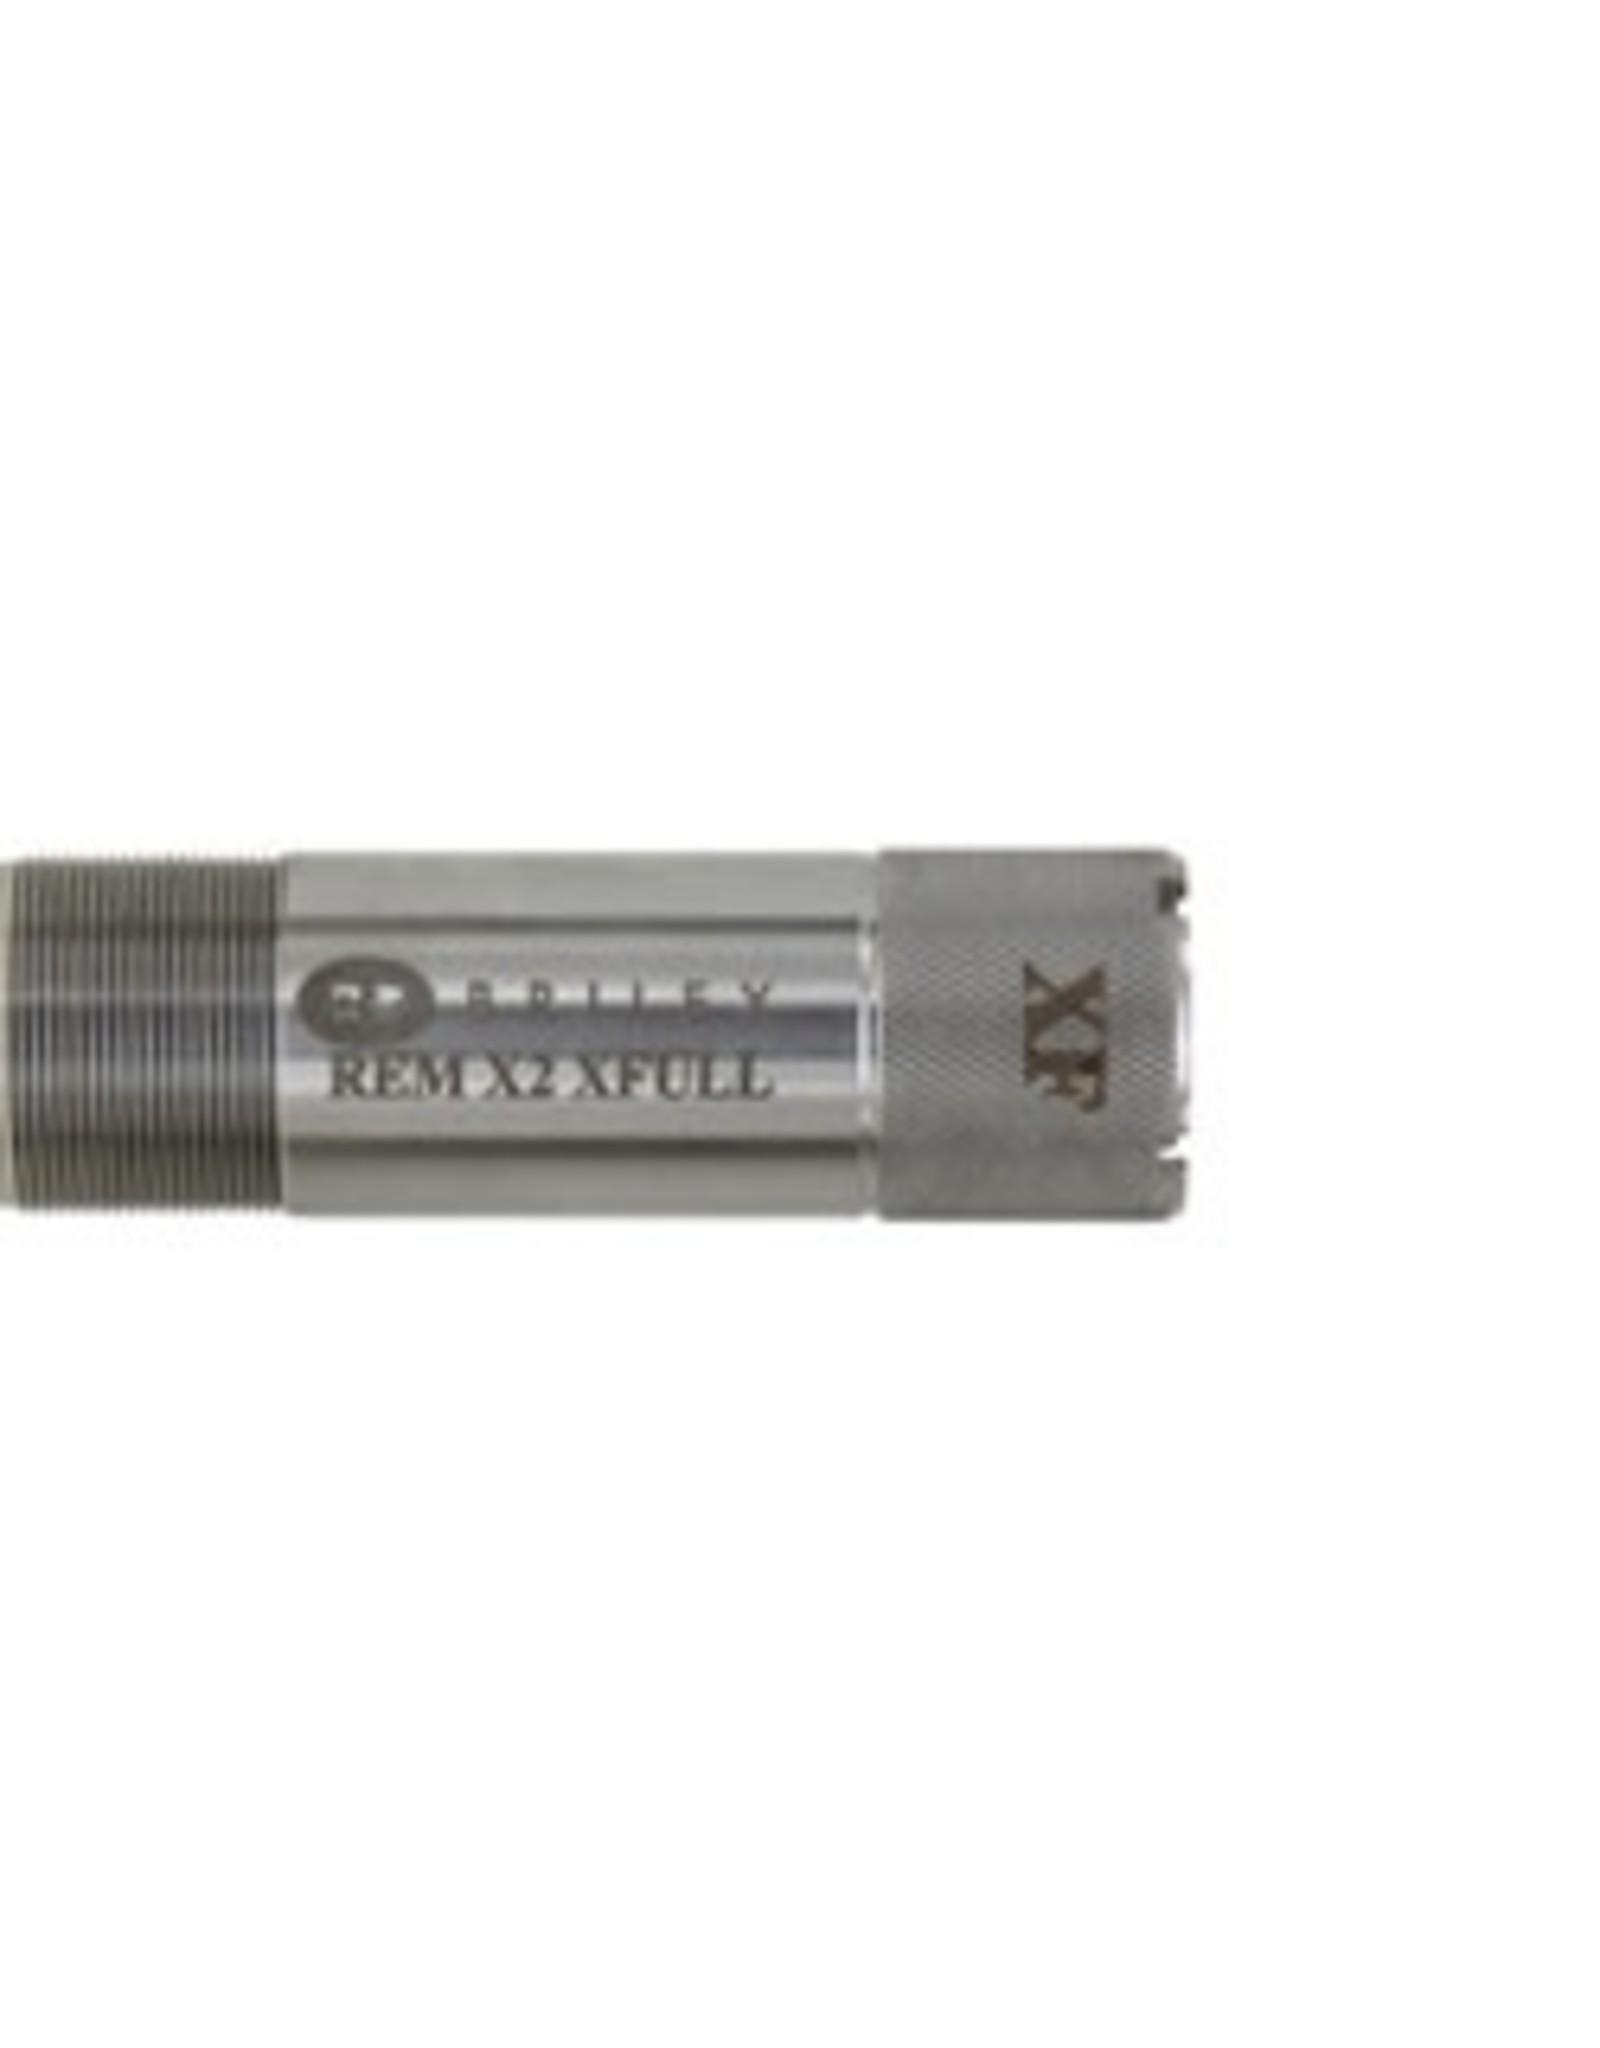 Remington 20ga Ext SS - Full